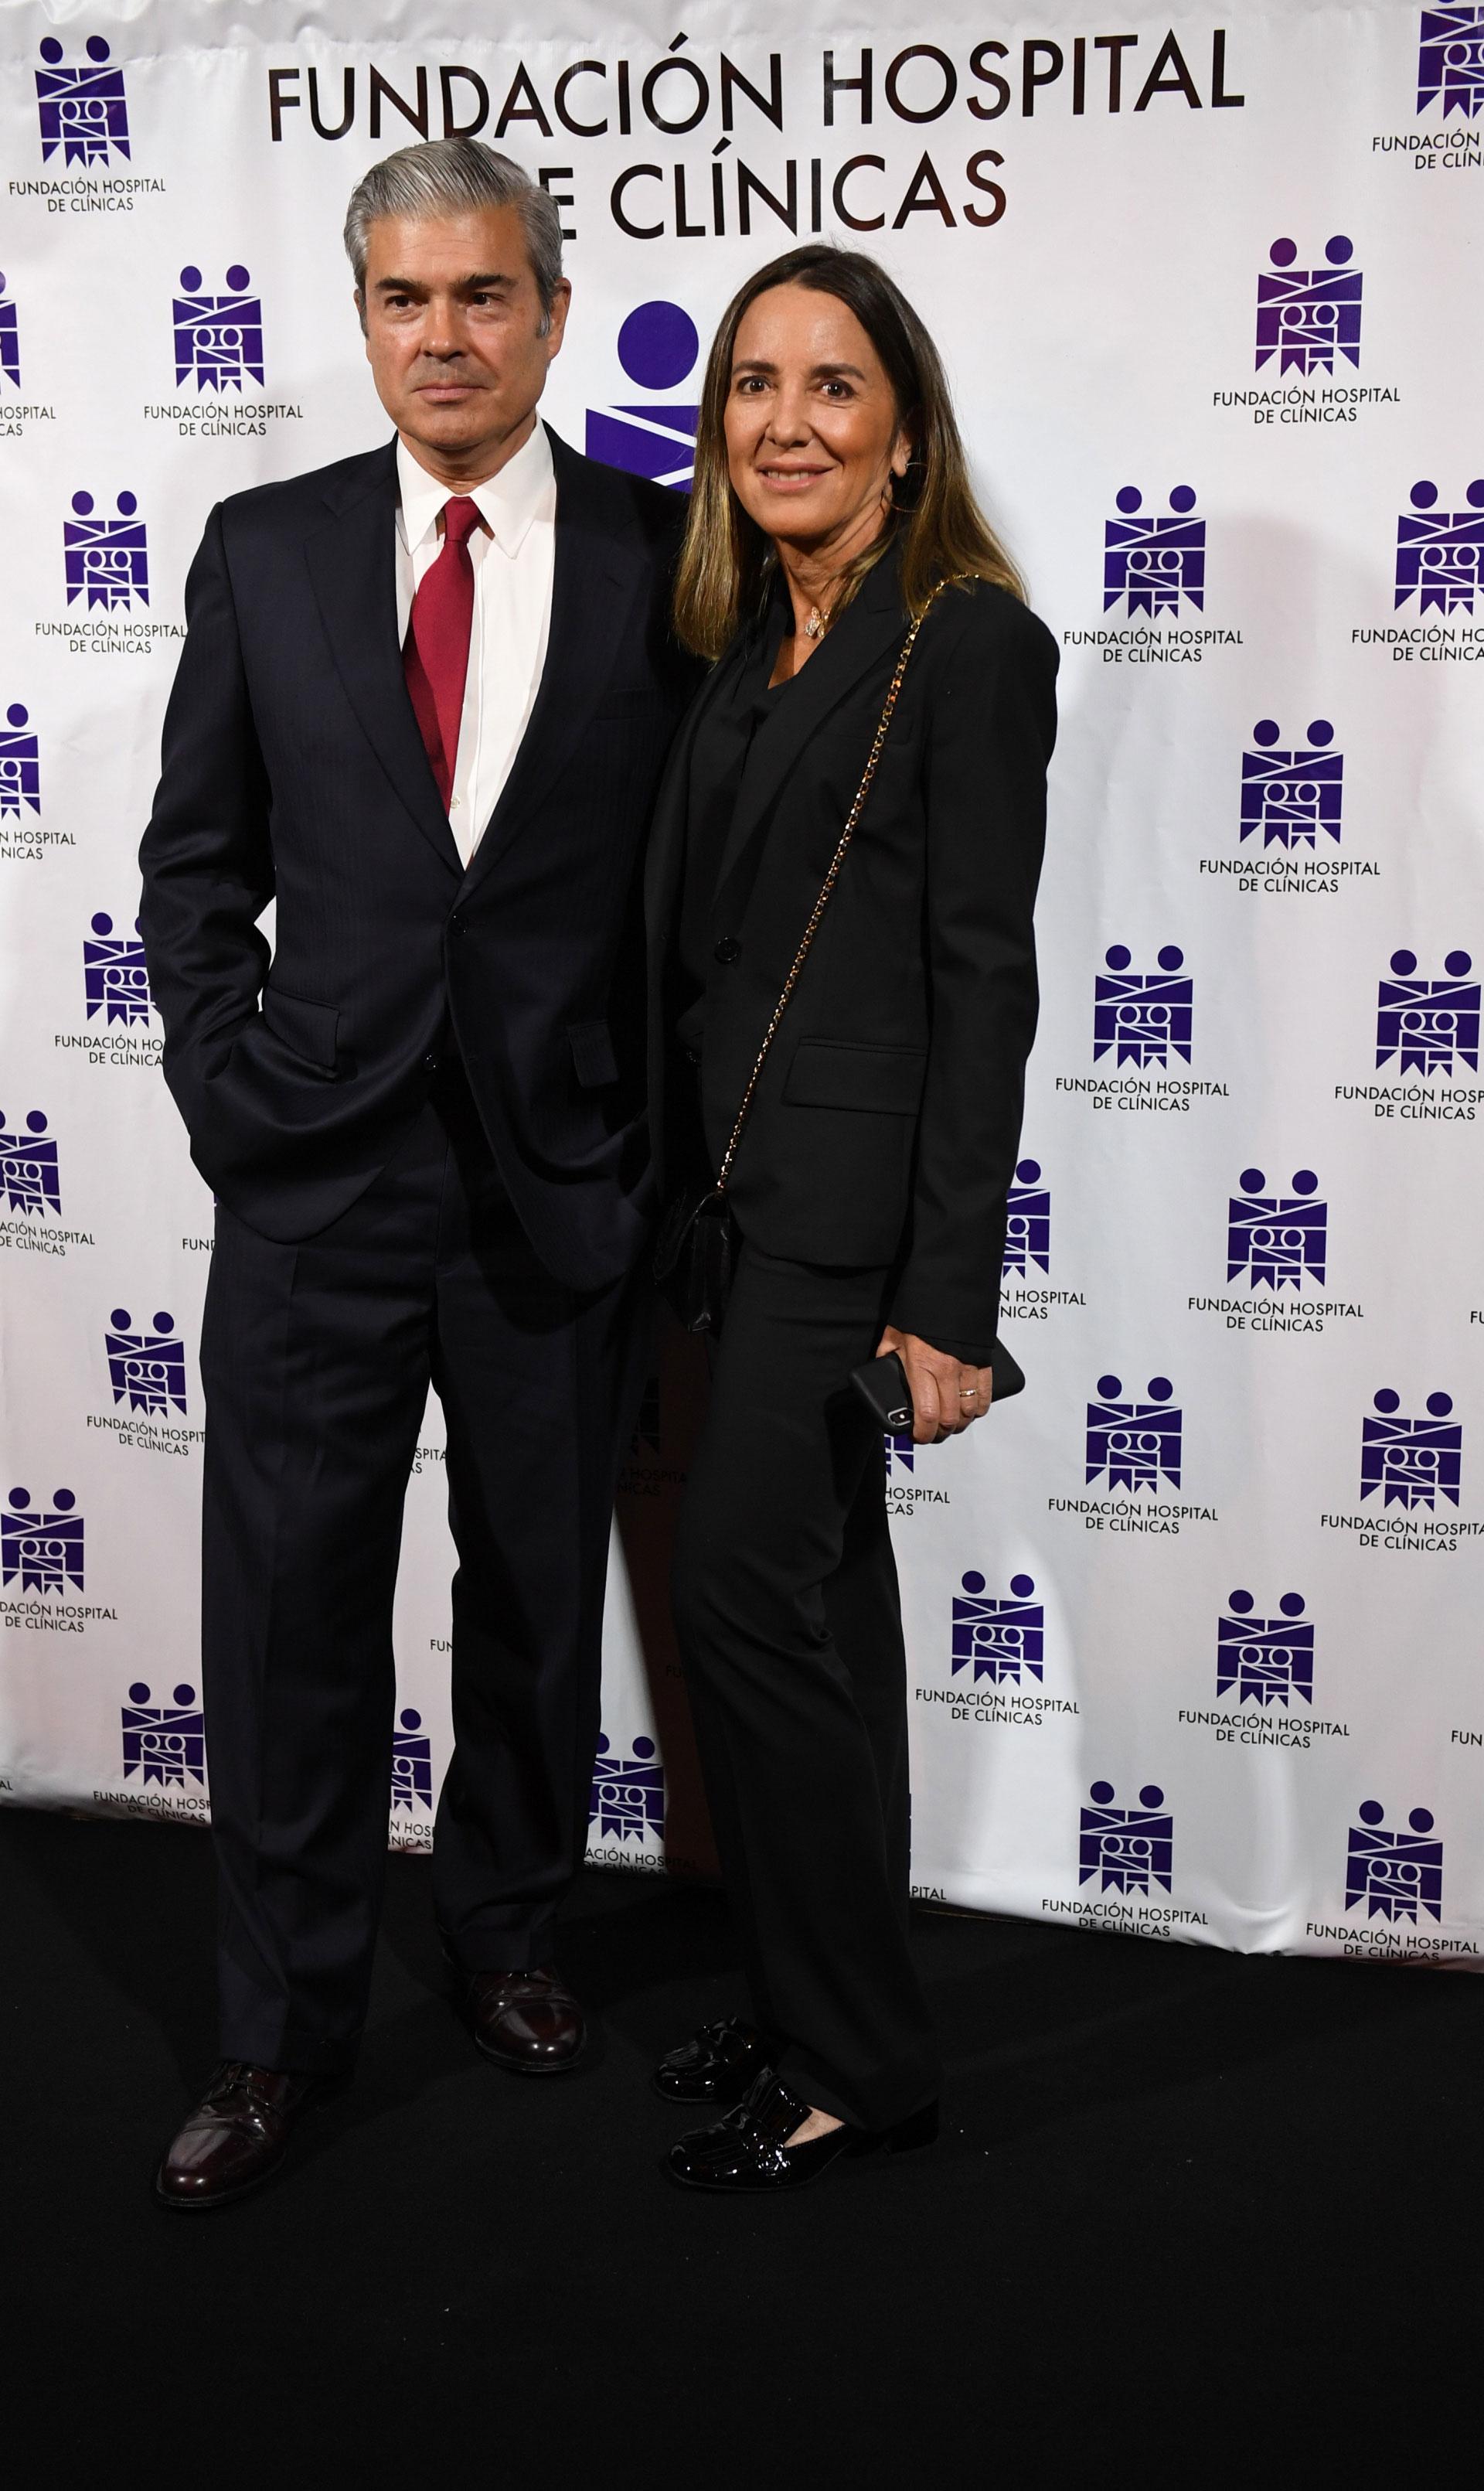 Bill Nutting y su mujer, Verónica Zoani de Nutting